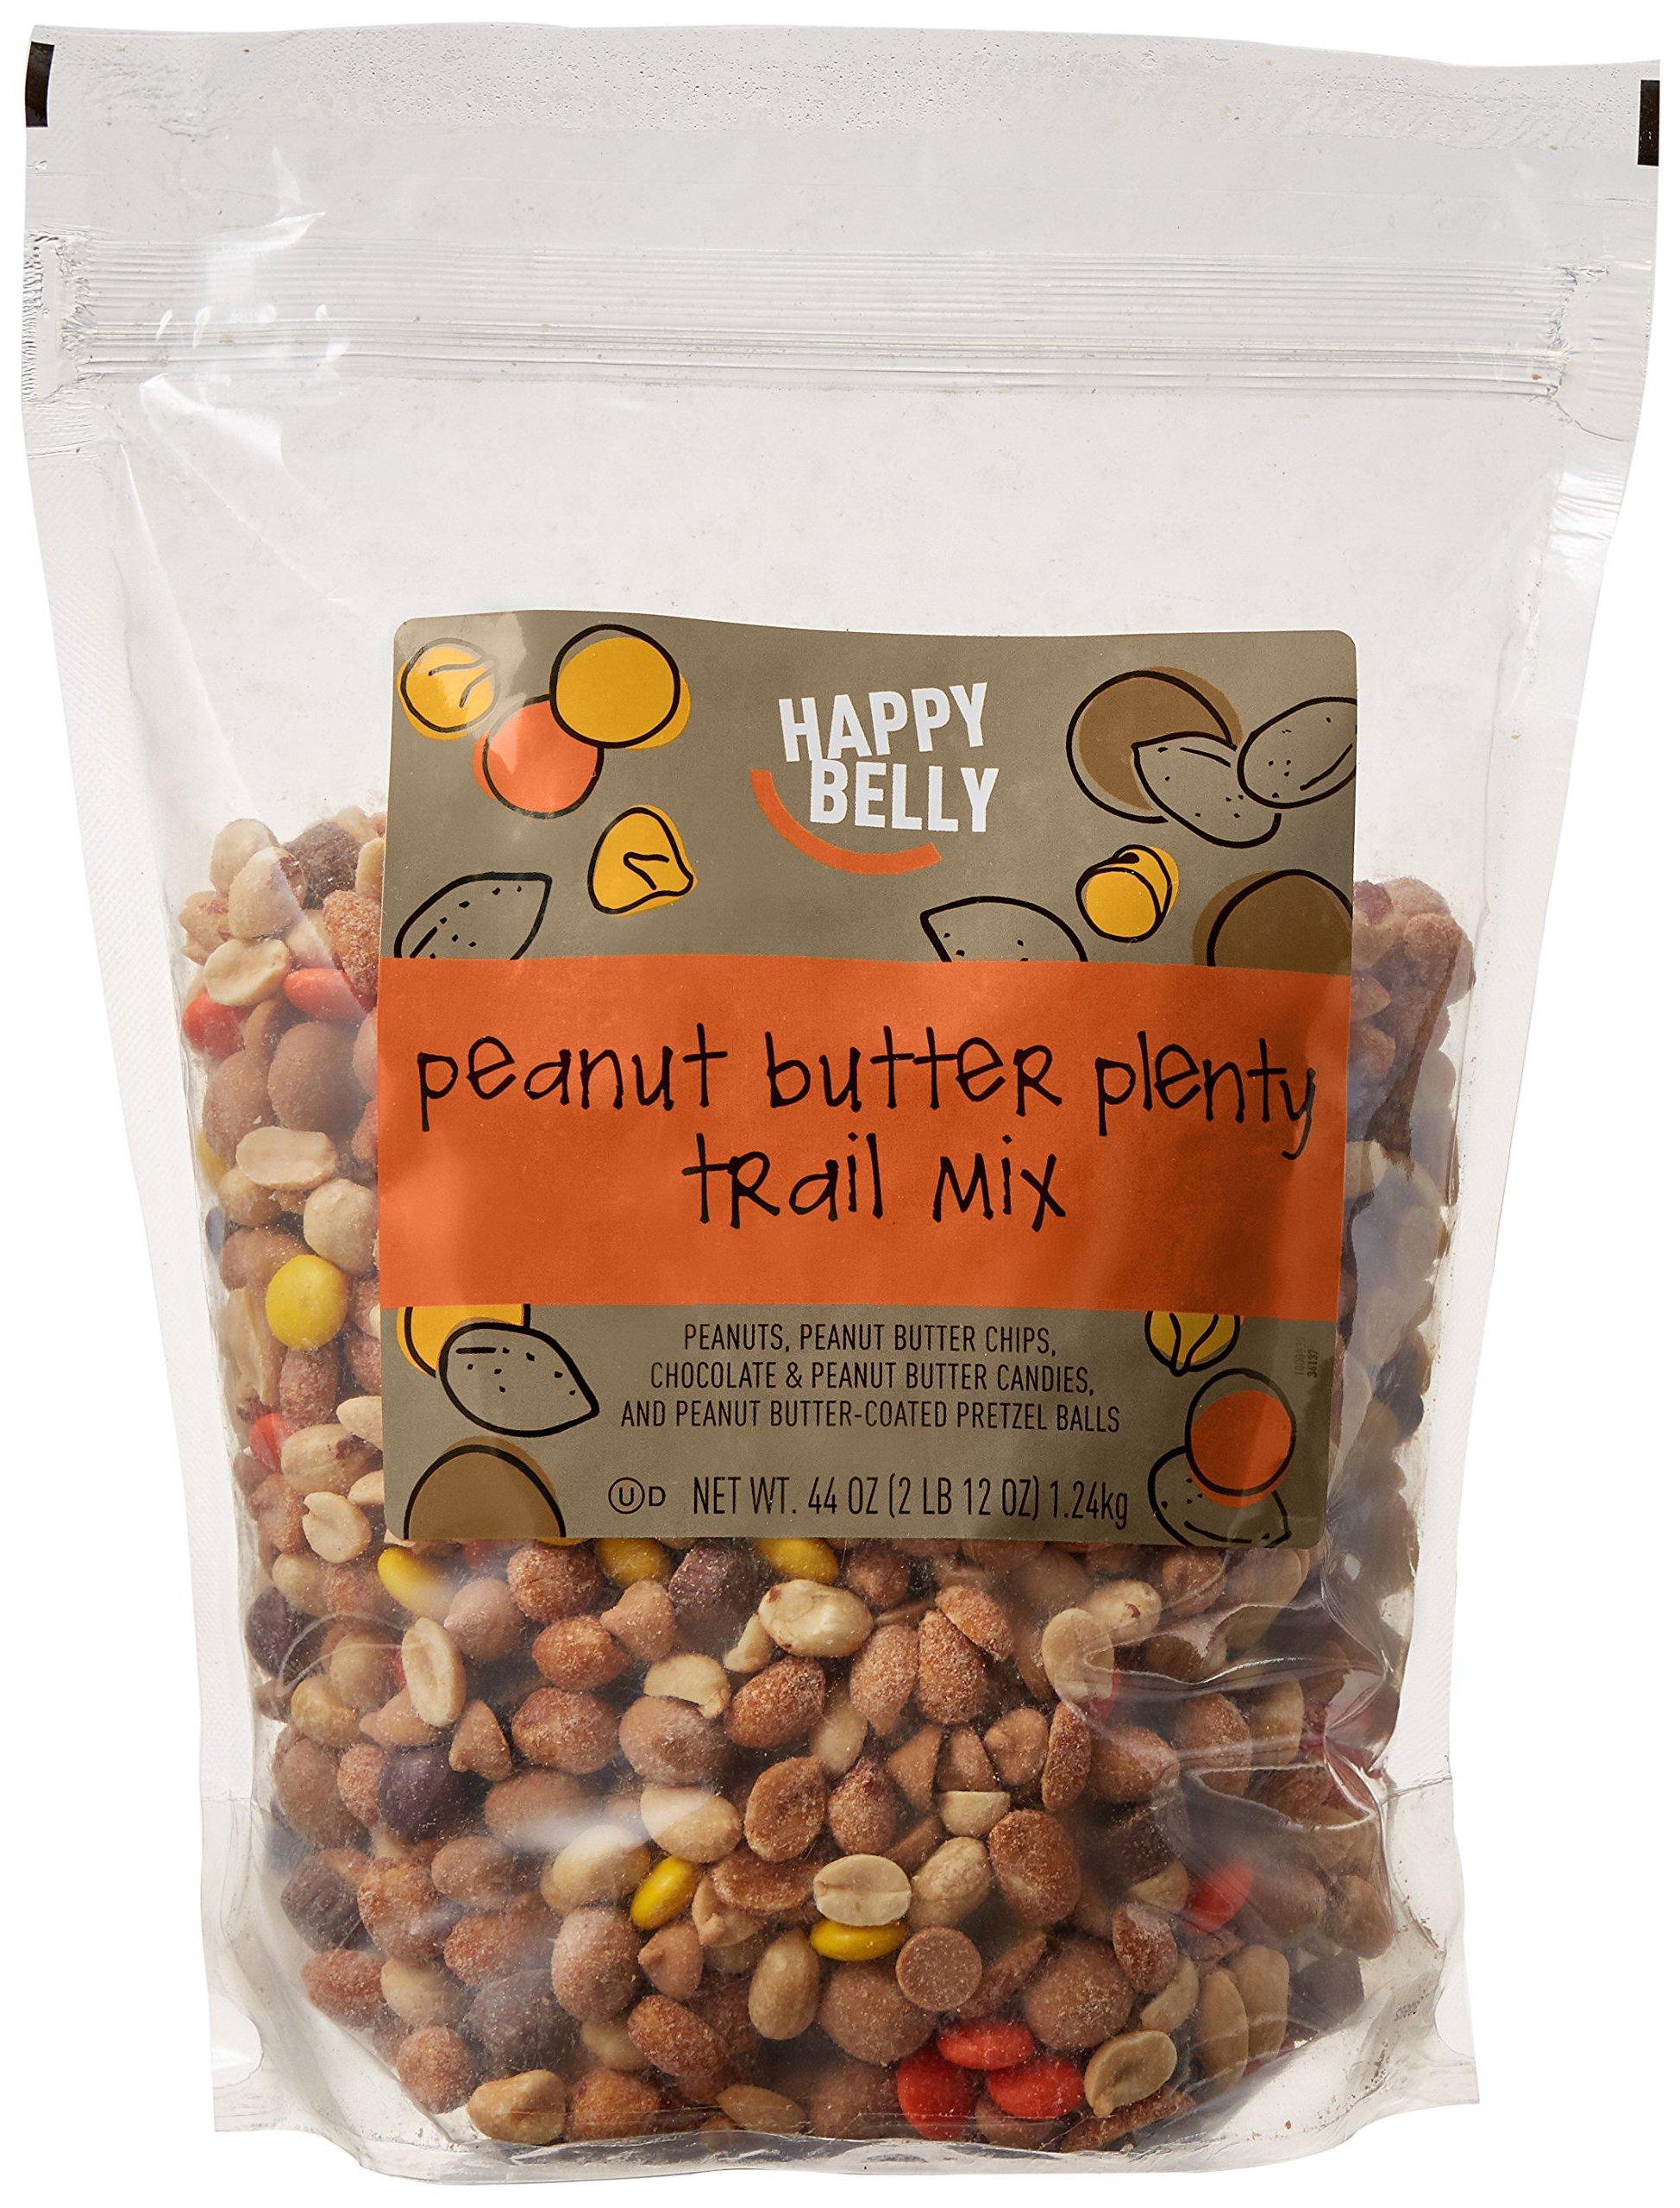 Amazon Brand - Happy Belly Amazon Brand Peanut Butter Plenty Trail Mix, 44 ounce